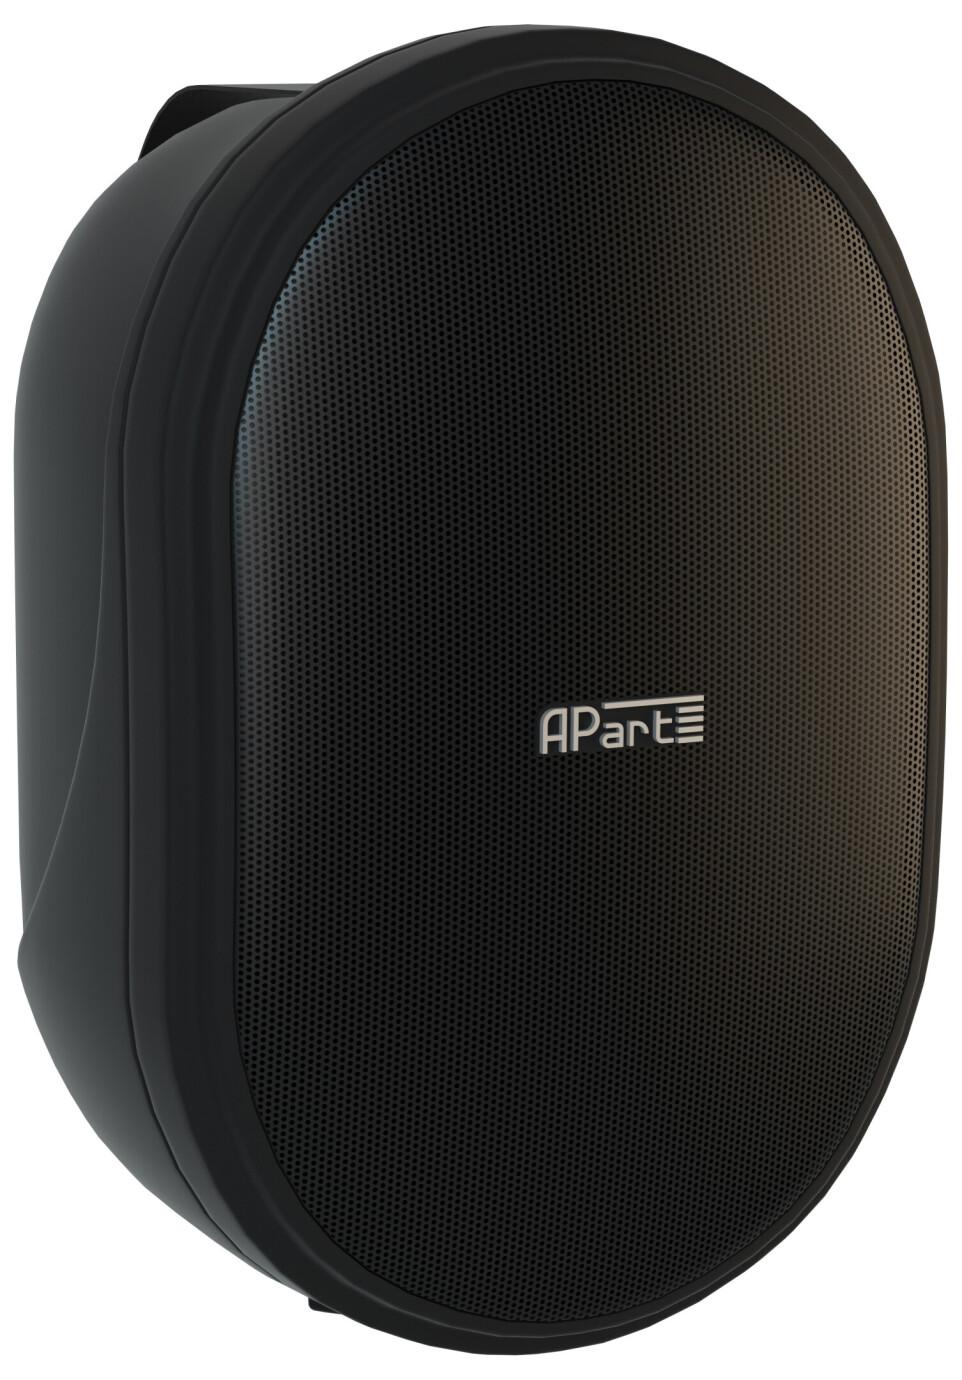 APart OVO5-BL Speaker / 1 Pair -80W - Black